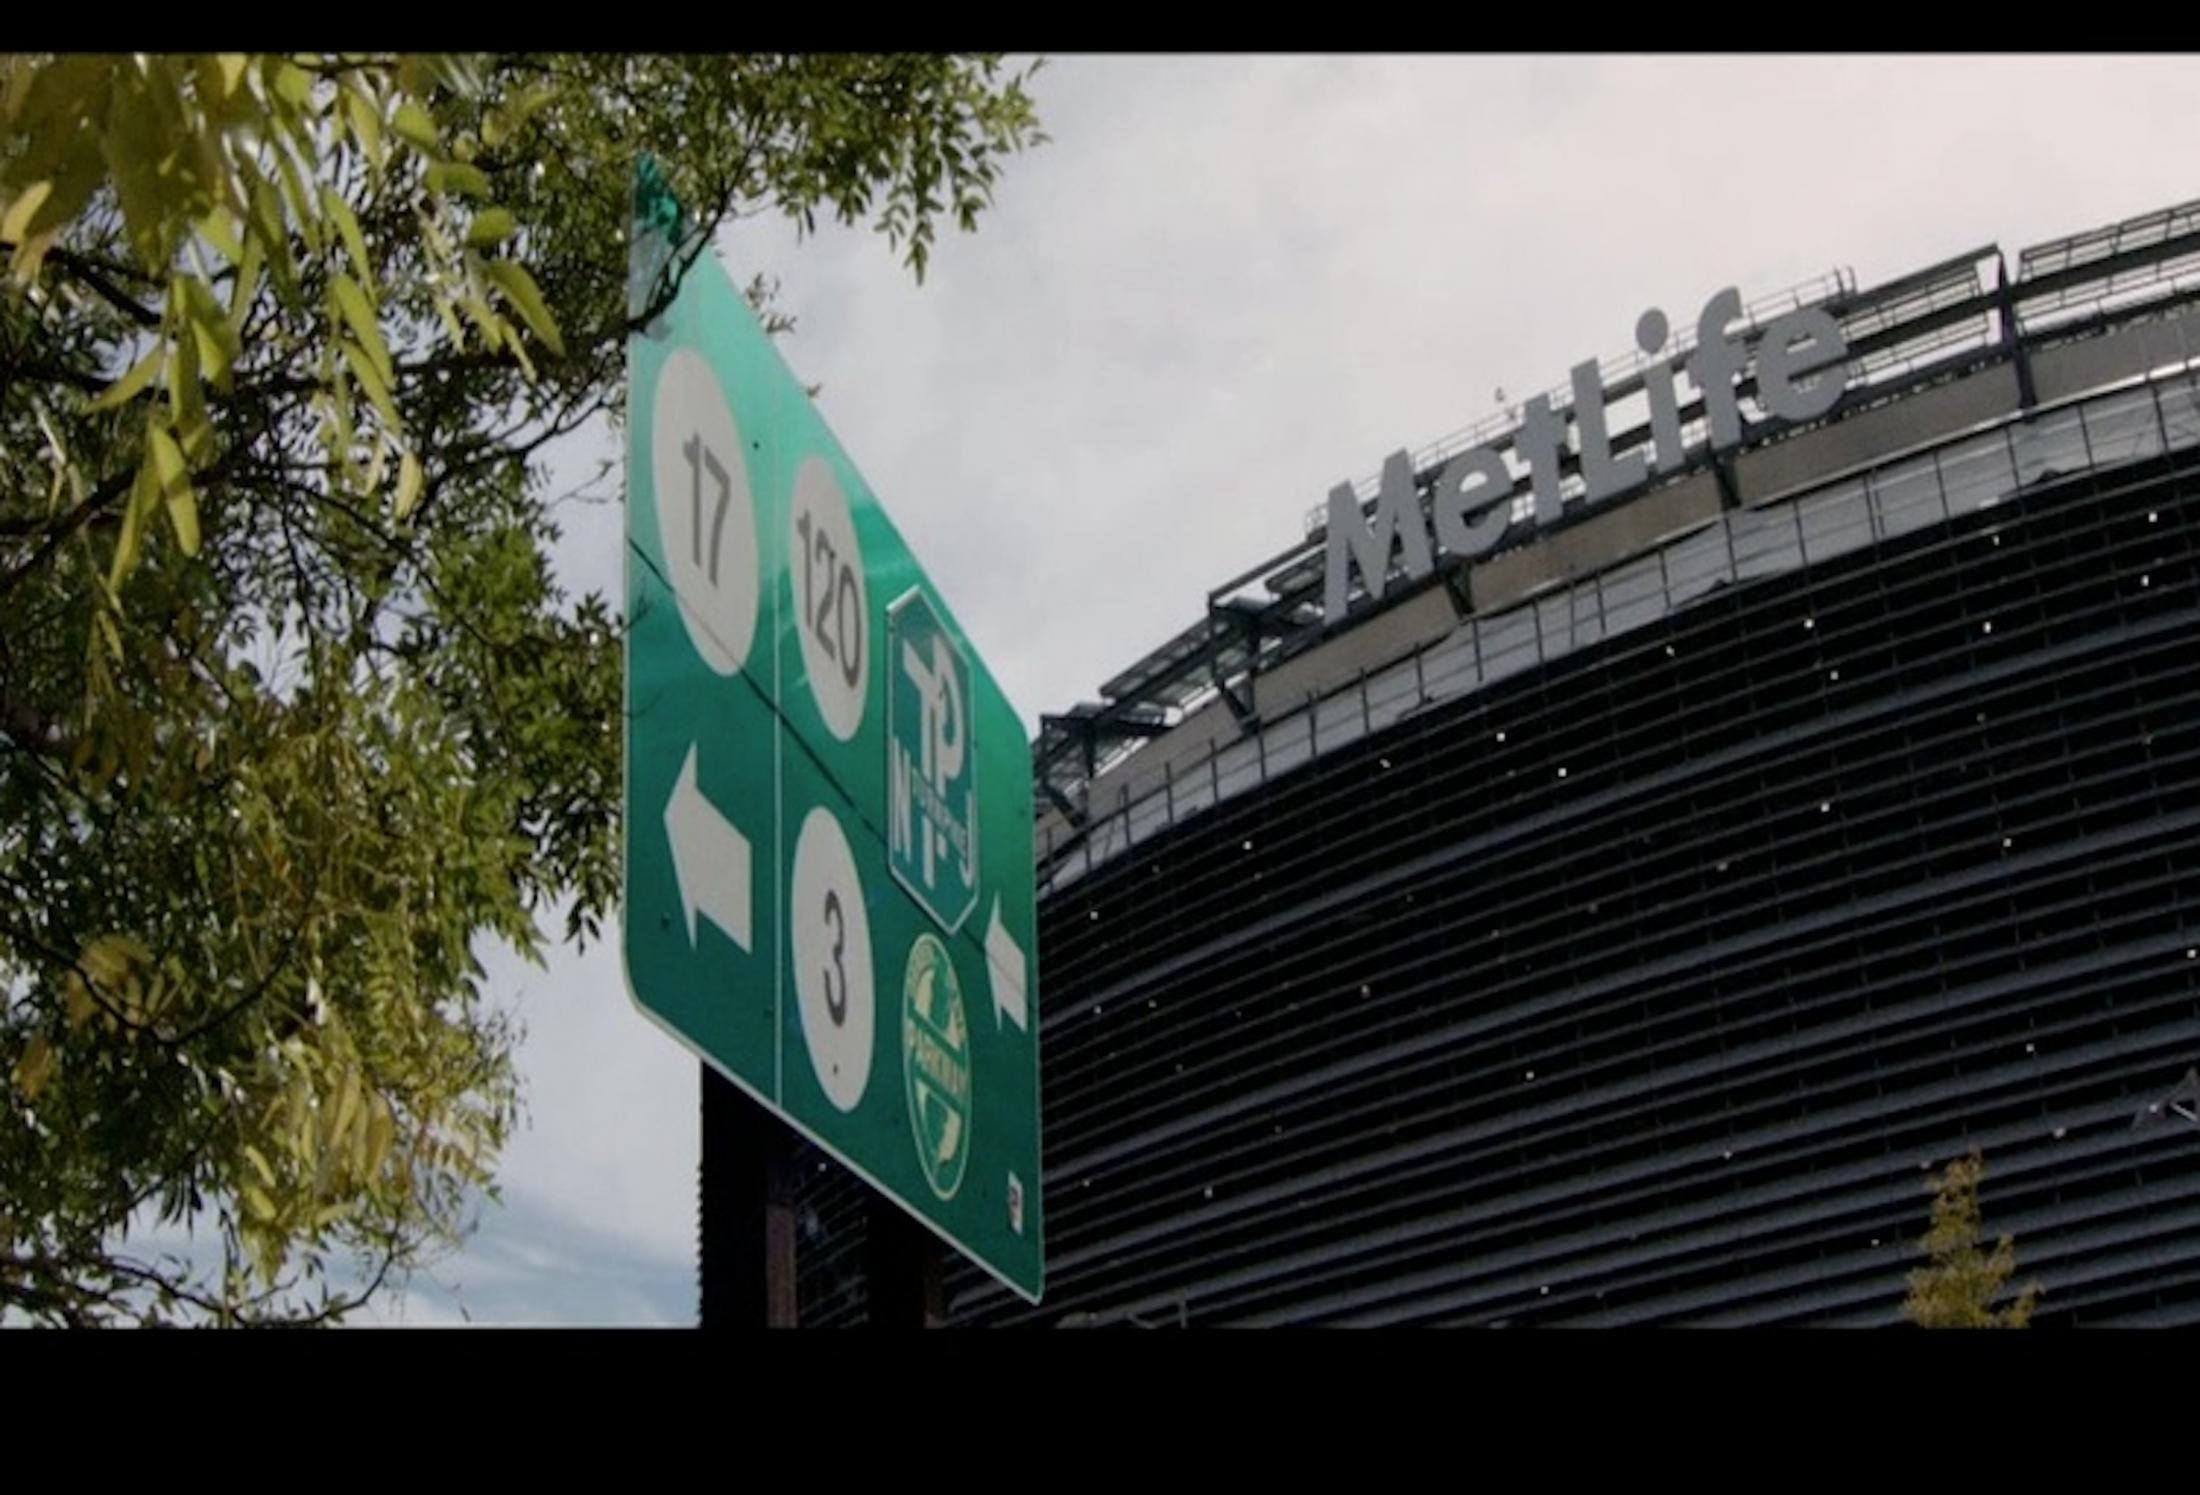 Thumbnail for Eagles Vs. Giants